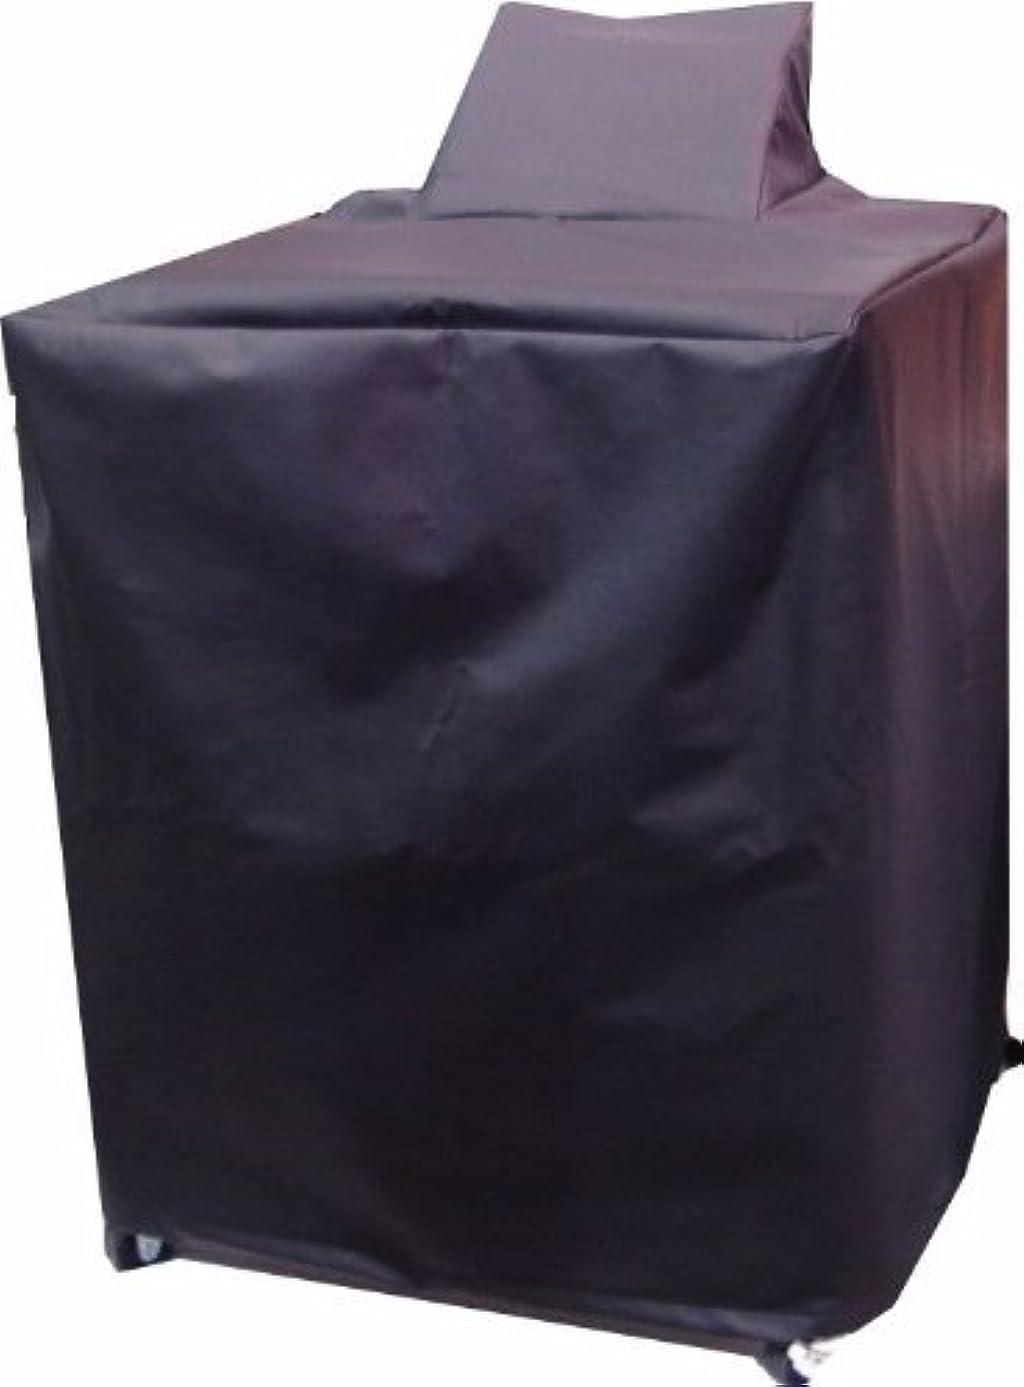 CharcoalStore cover for Cookshack SM025 Smokette